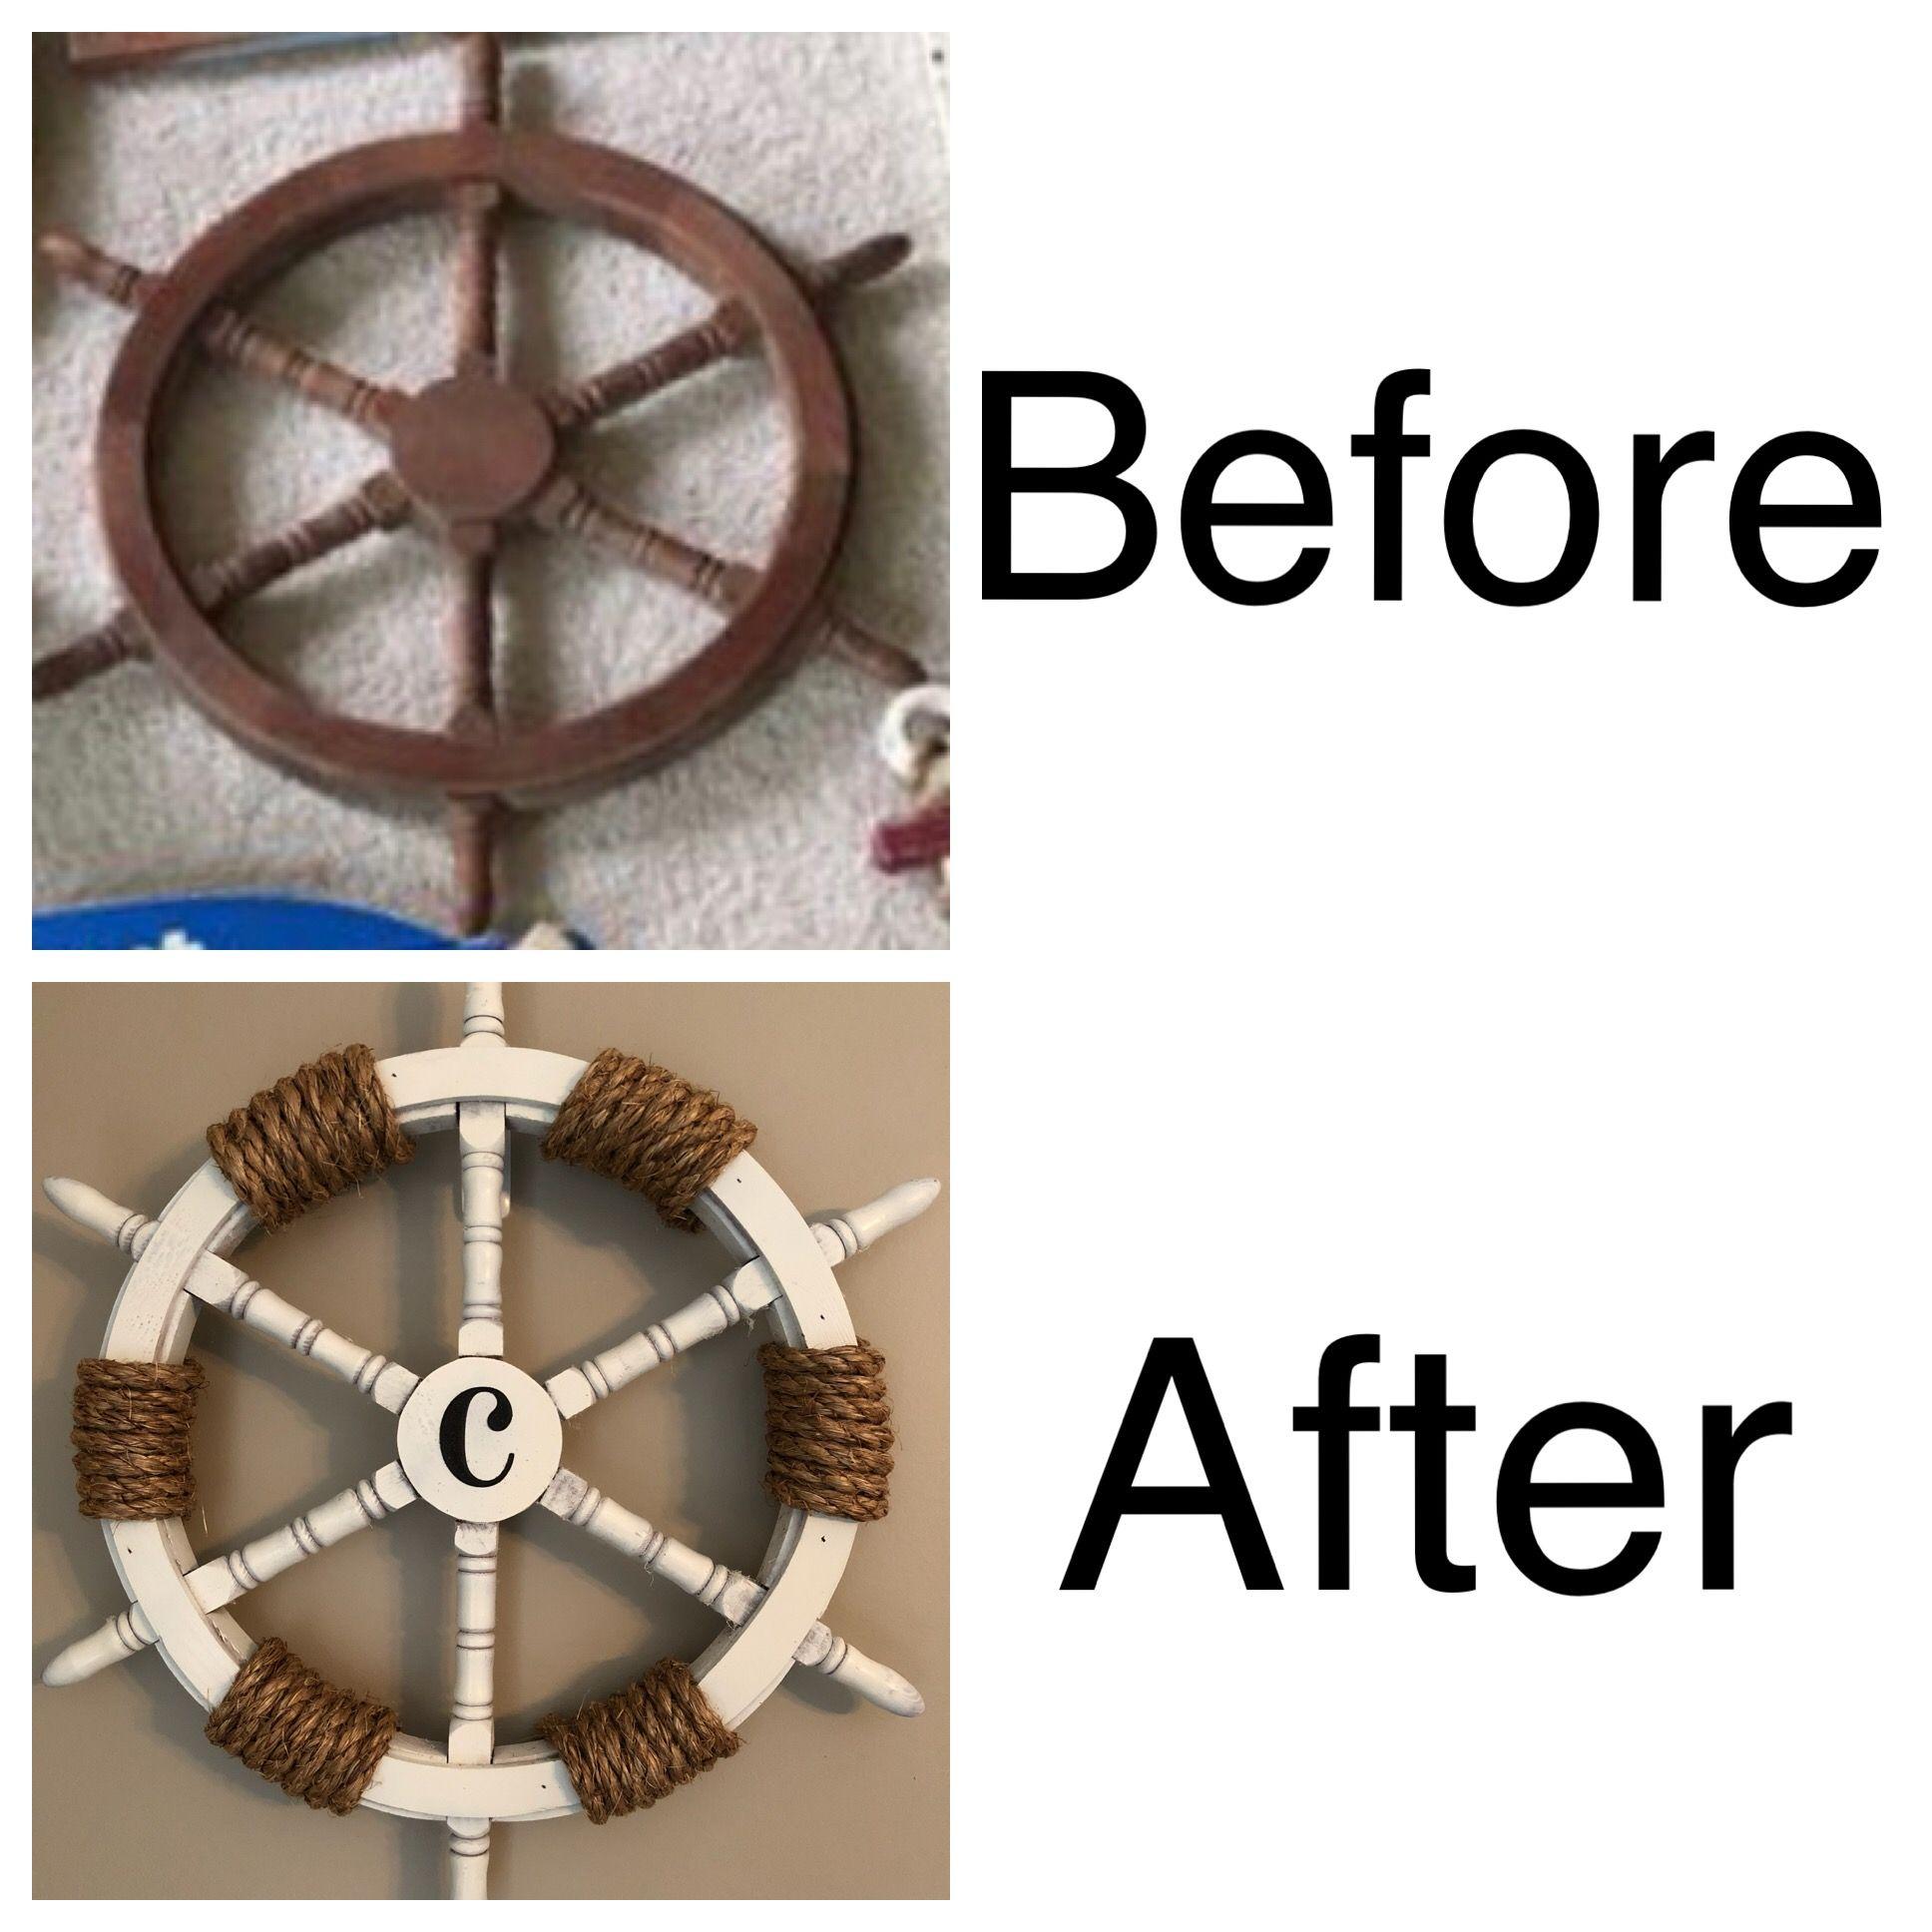 Diy Nautical Decorations Ships Helm Ship Wheel Decor Nautical Decor Diy Ship Wheel